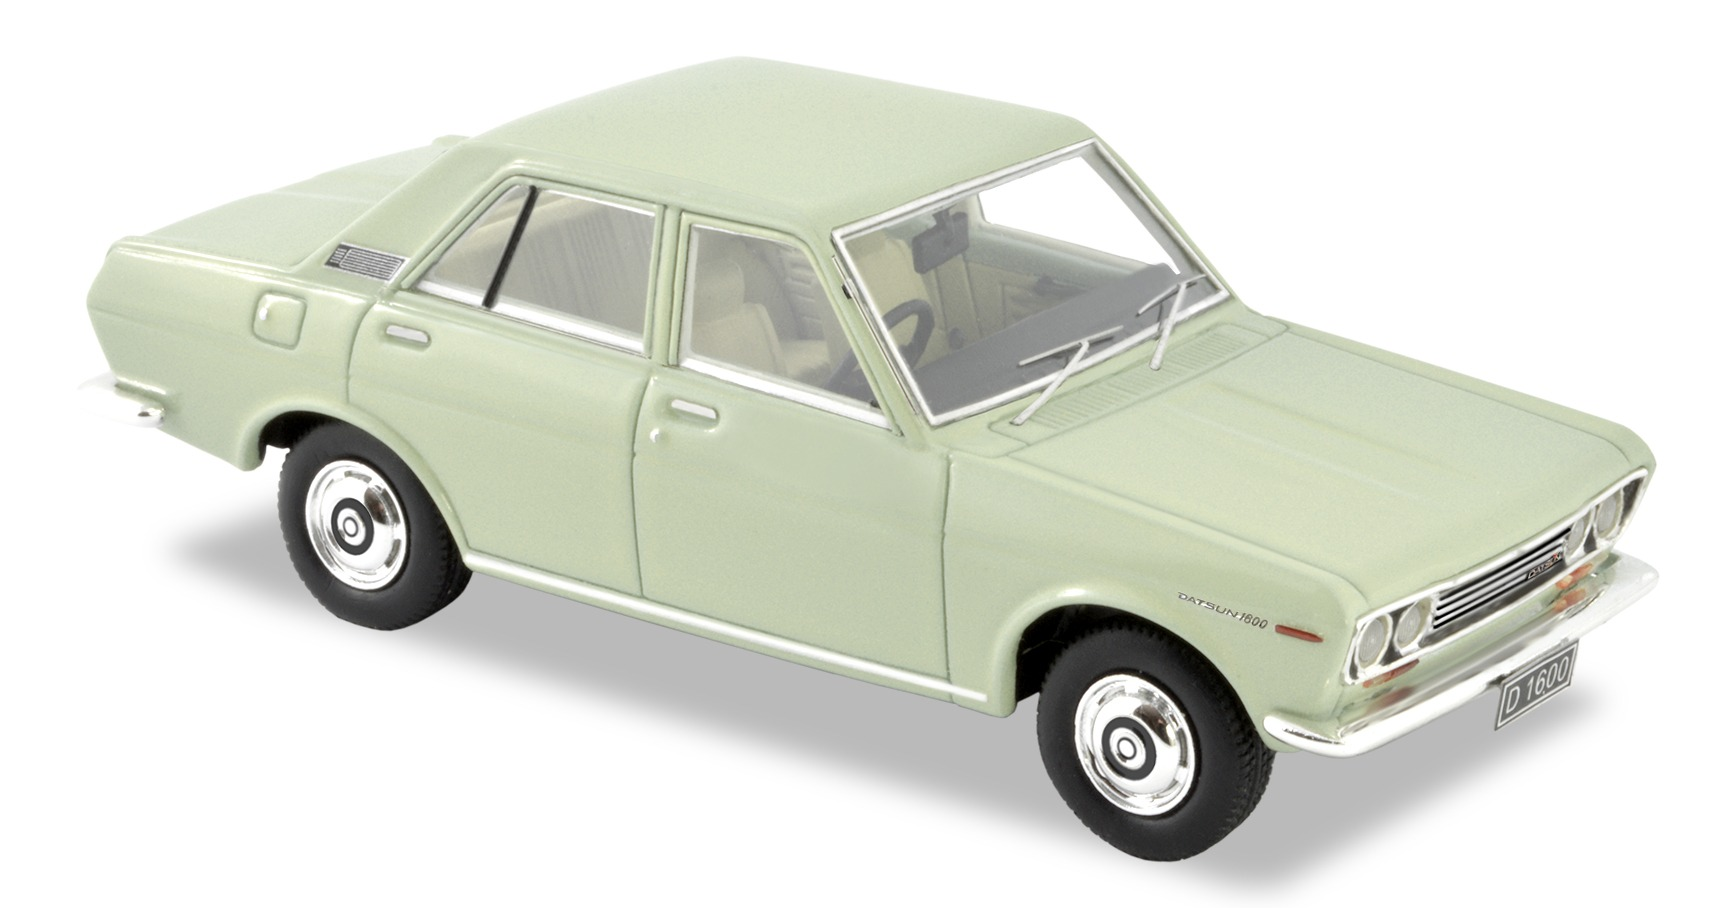 1970 Datsun 1600 – Ascot Green.